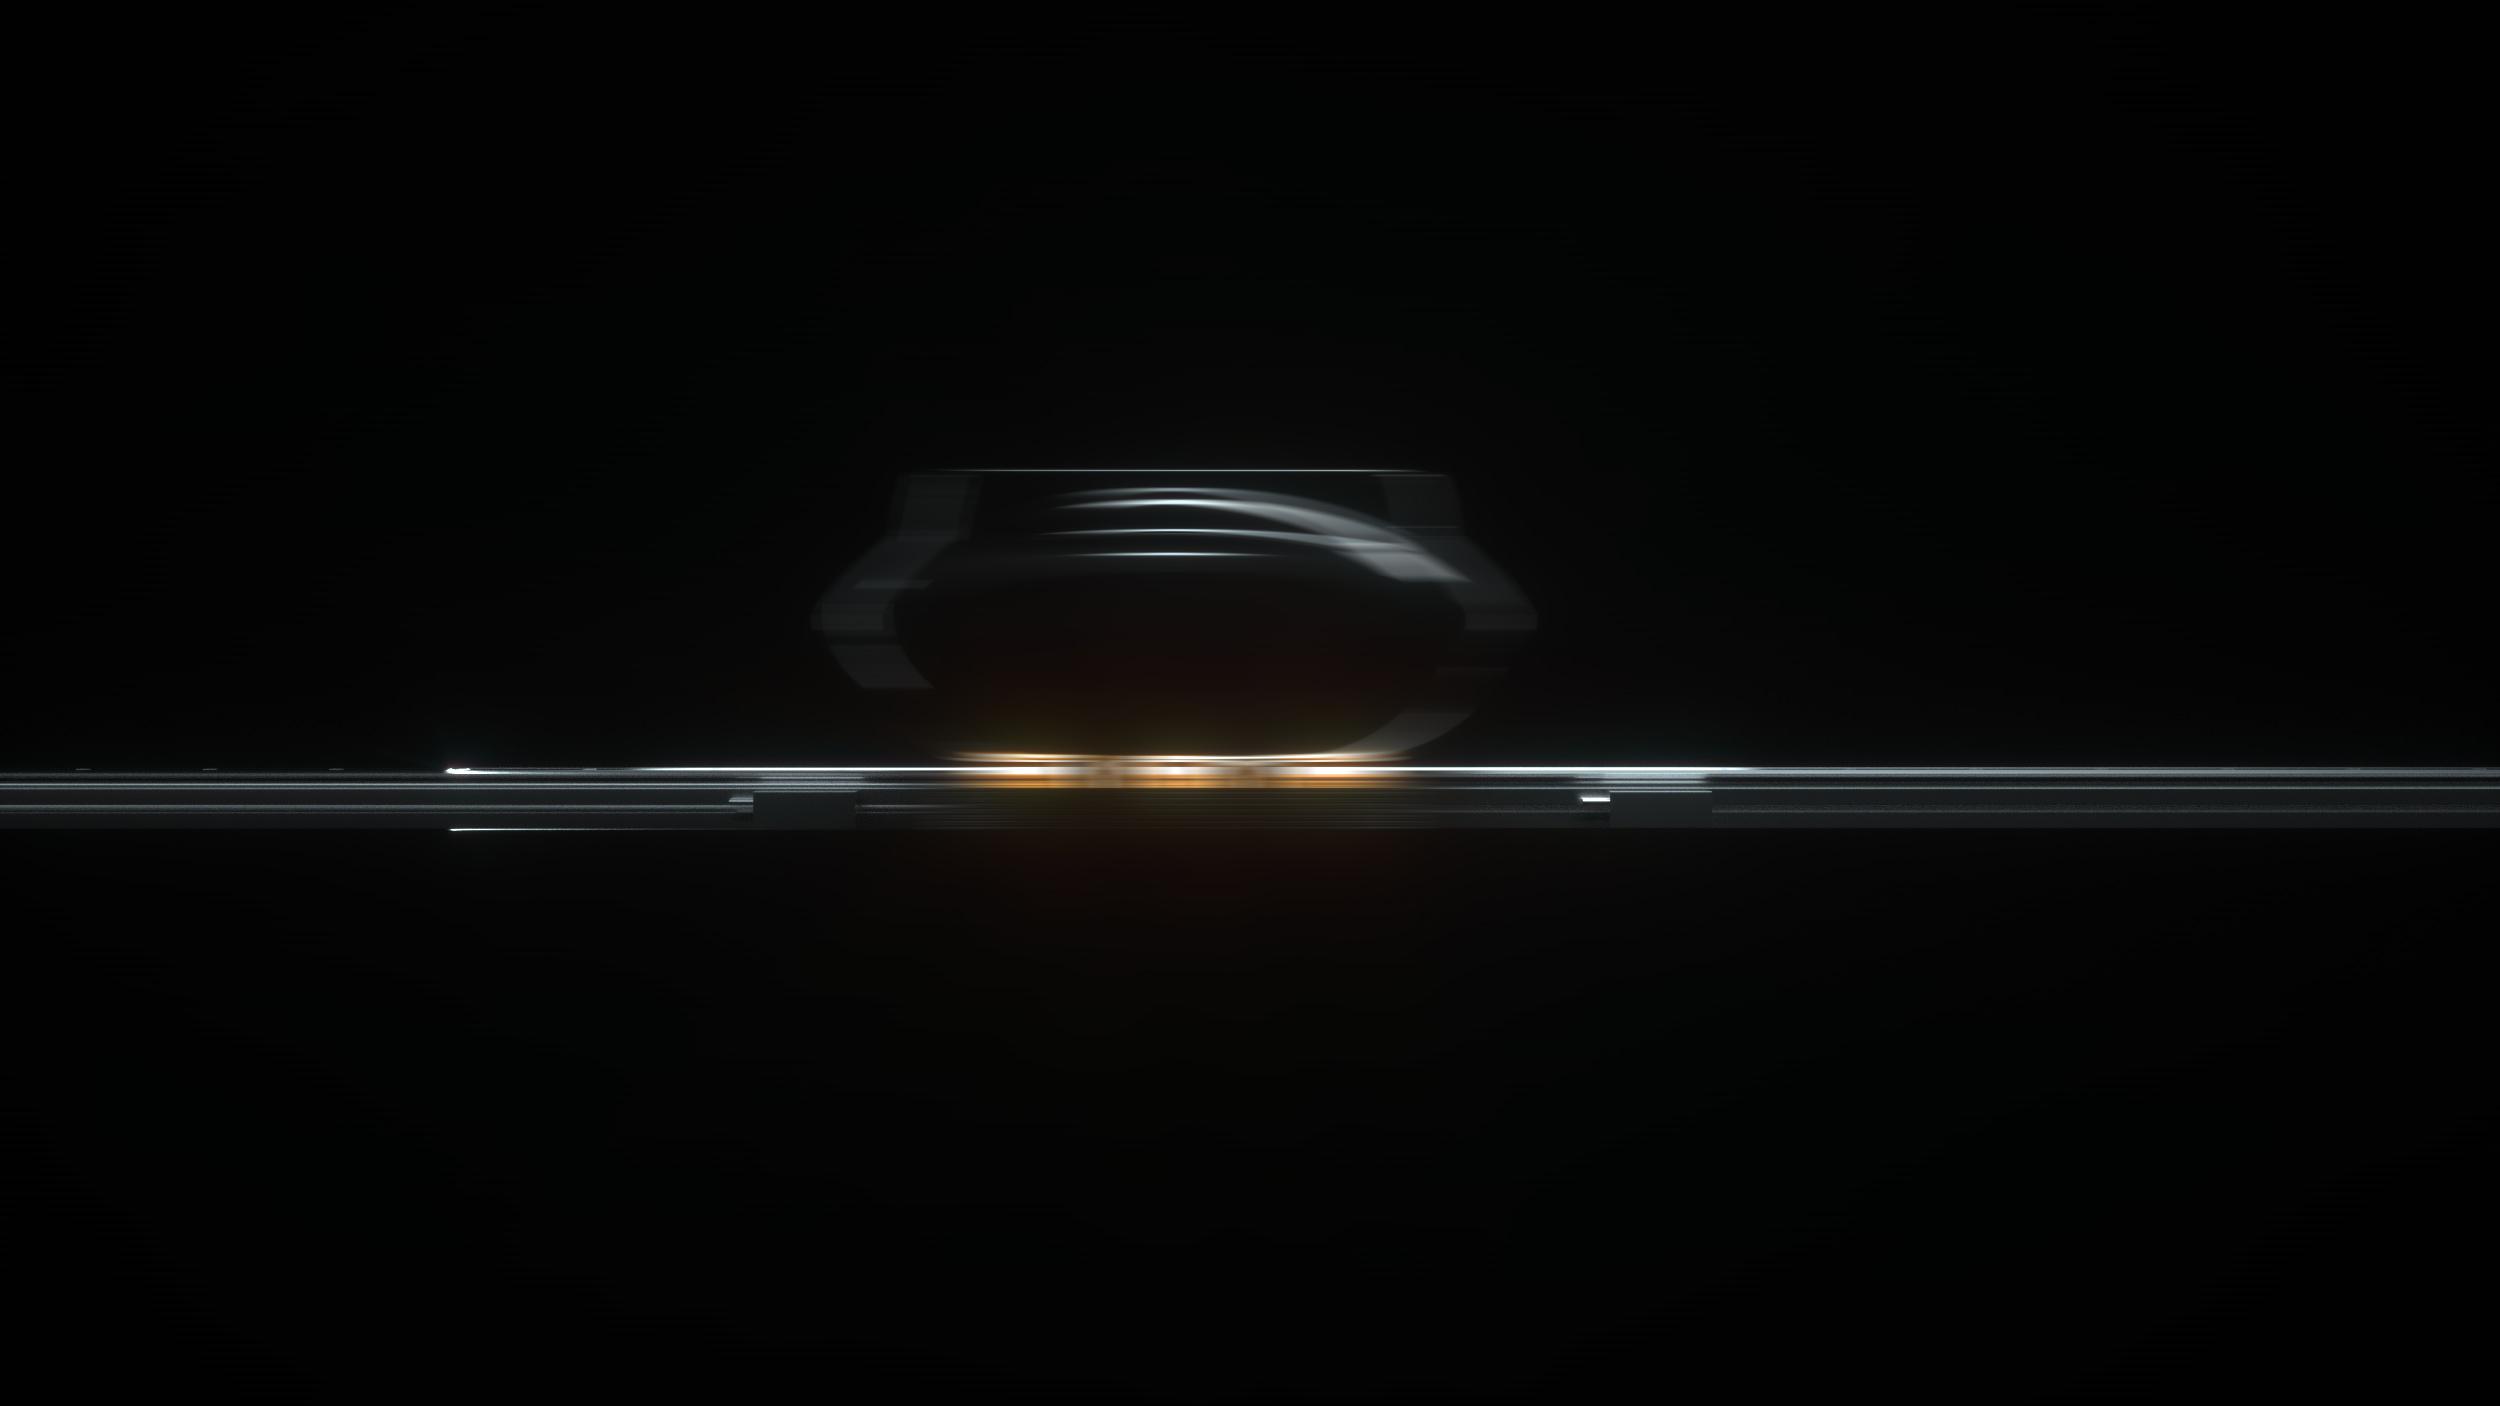 Product_3 blur.jpg